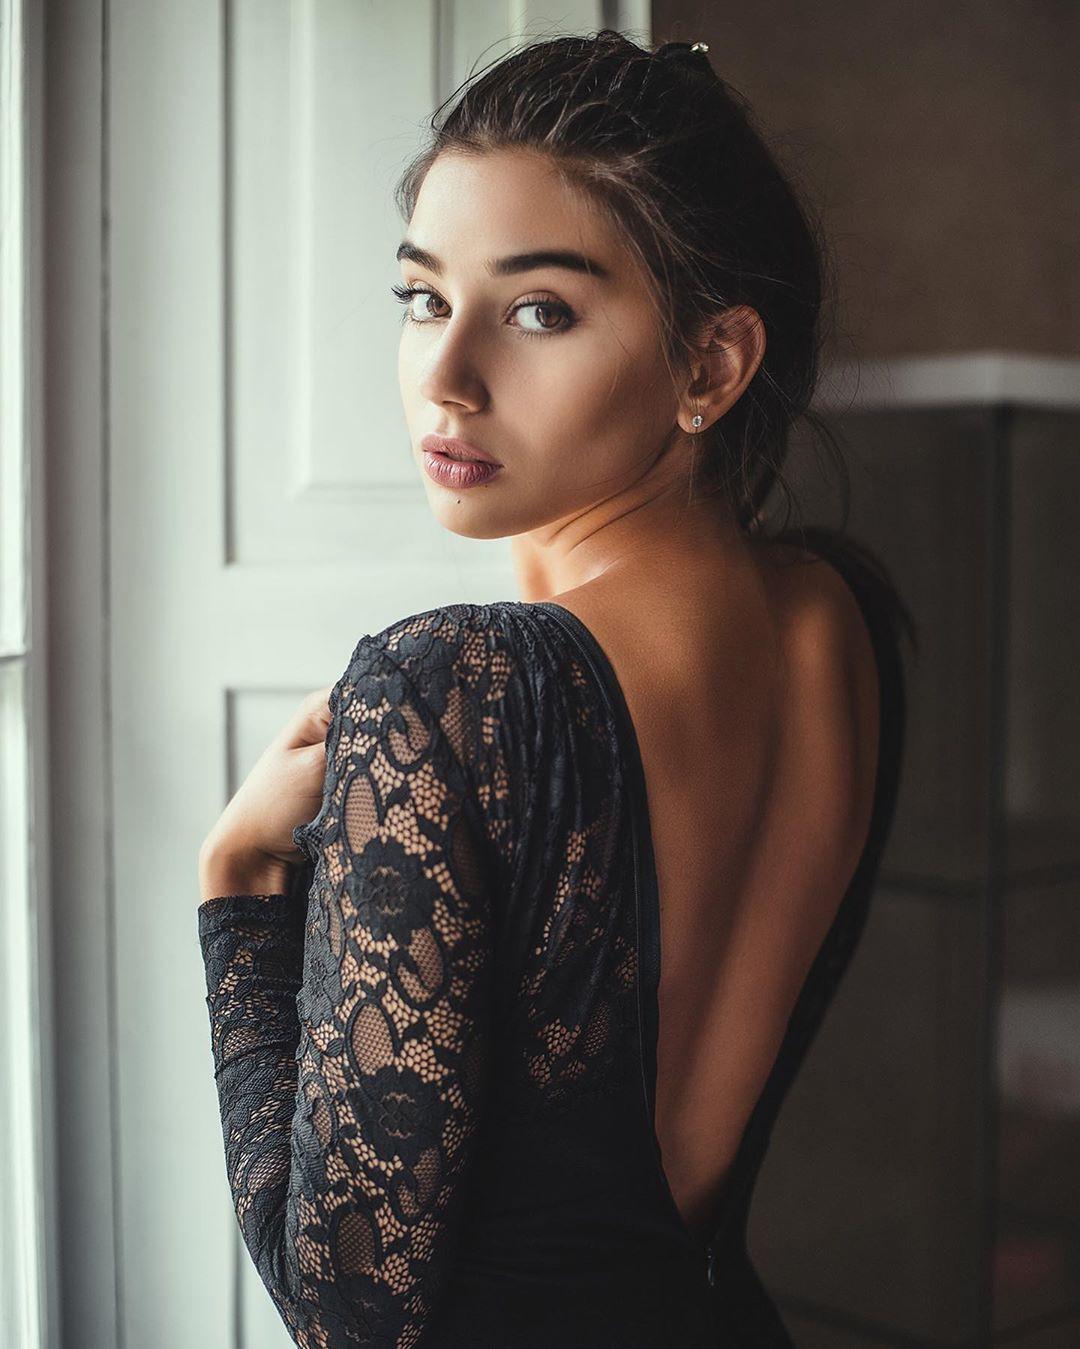 Maja Strojek girls photoshoot, Natural Lips, Hot Model